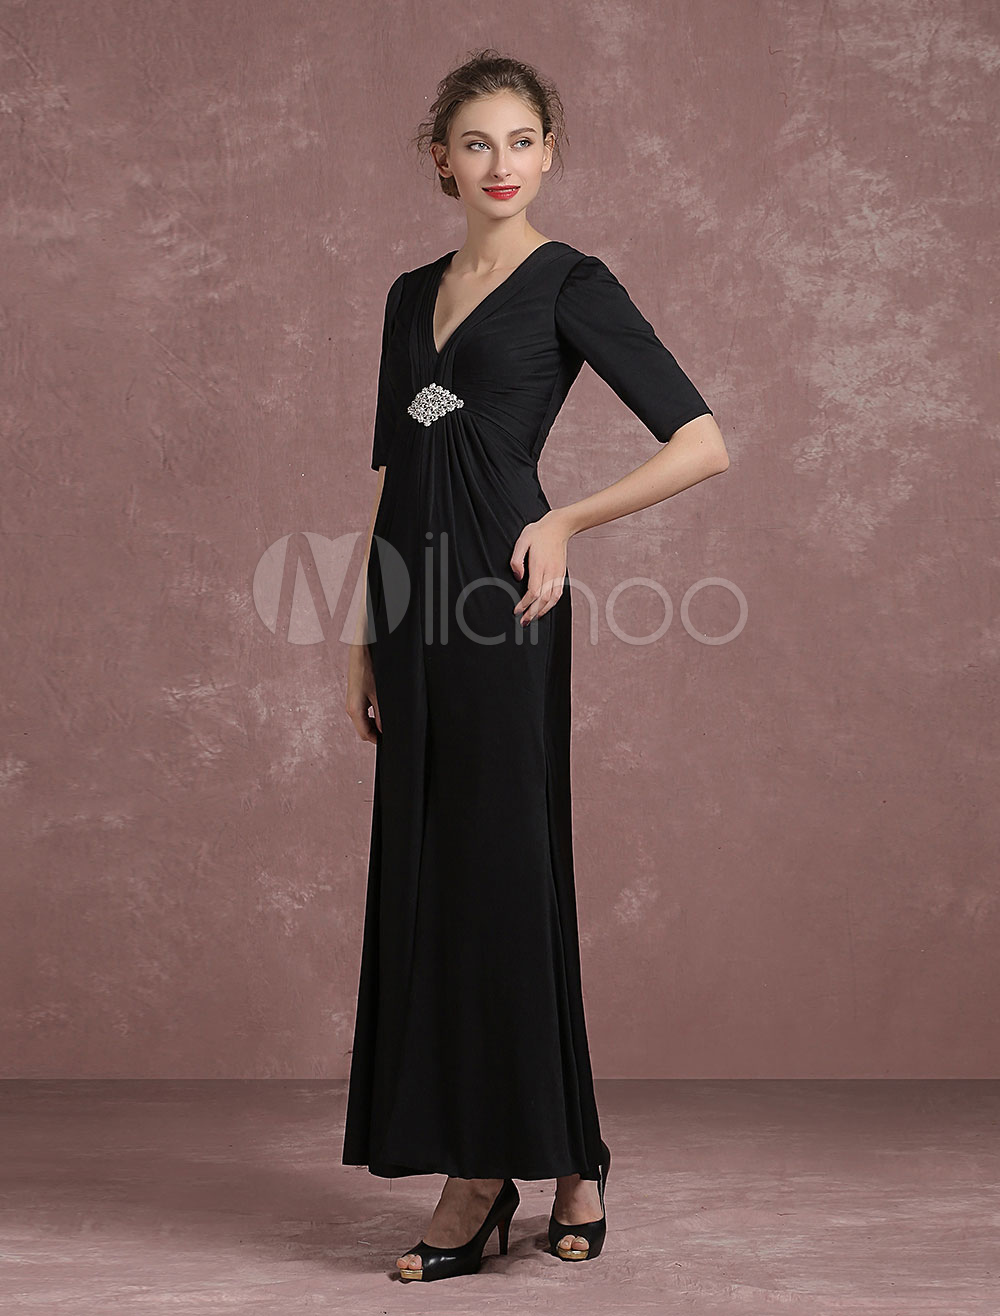 Black Evening Dress Rhinestone Pleated Mother Of The Bride Dress V Neck Half Sleeve Slit Ankle Length Party Dress Milanoo